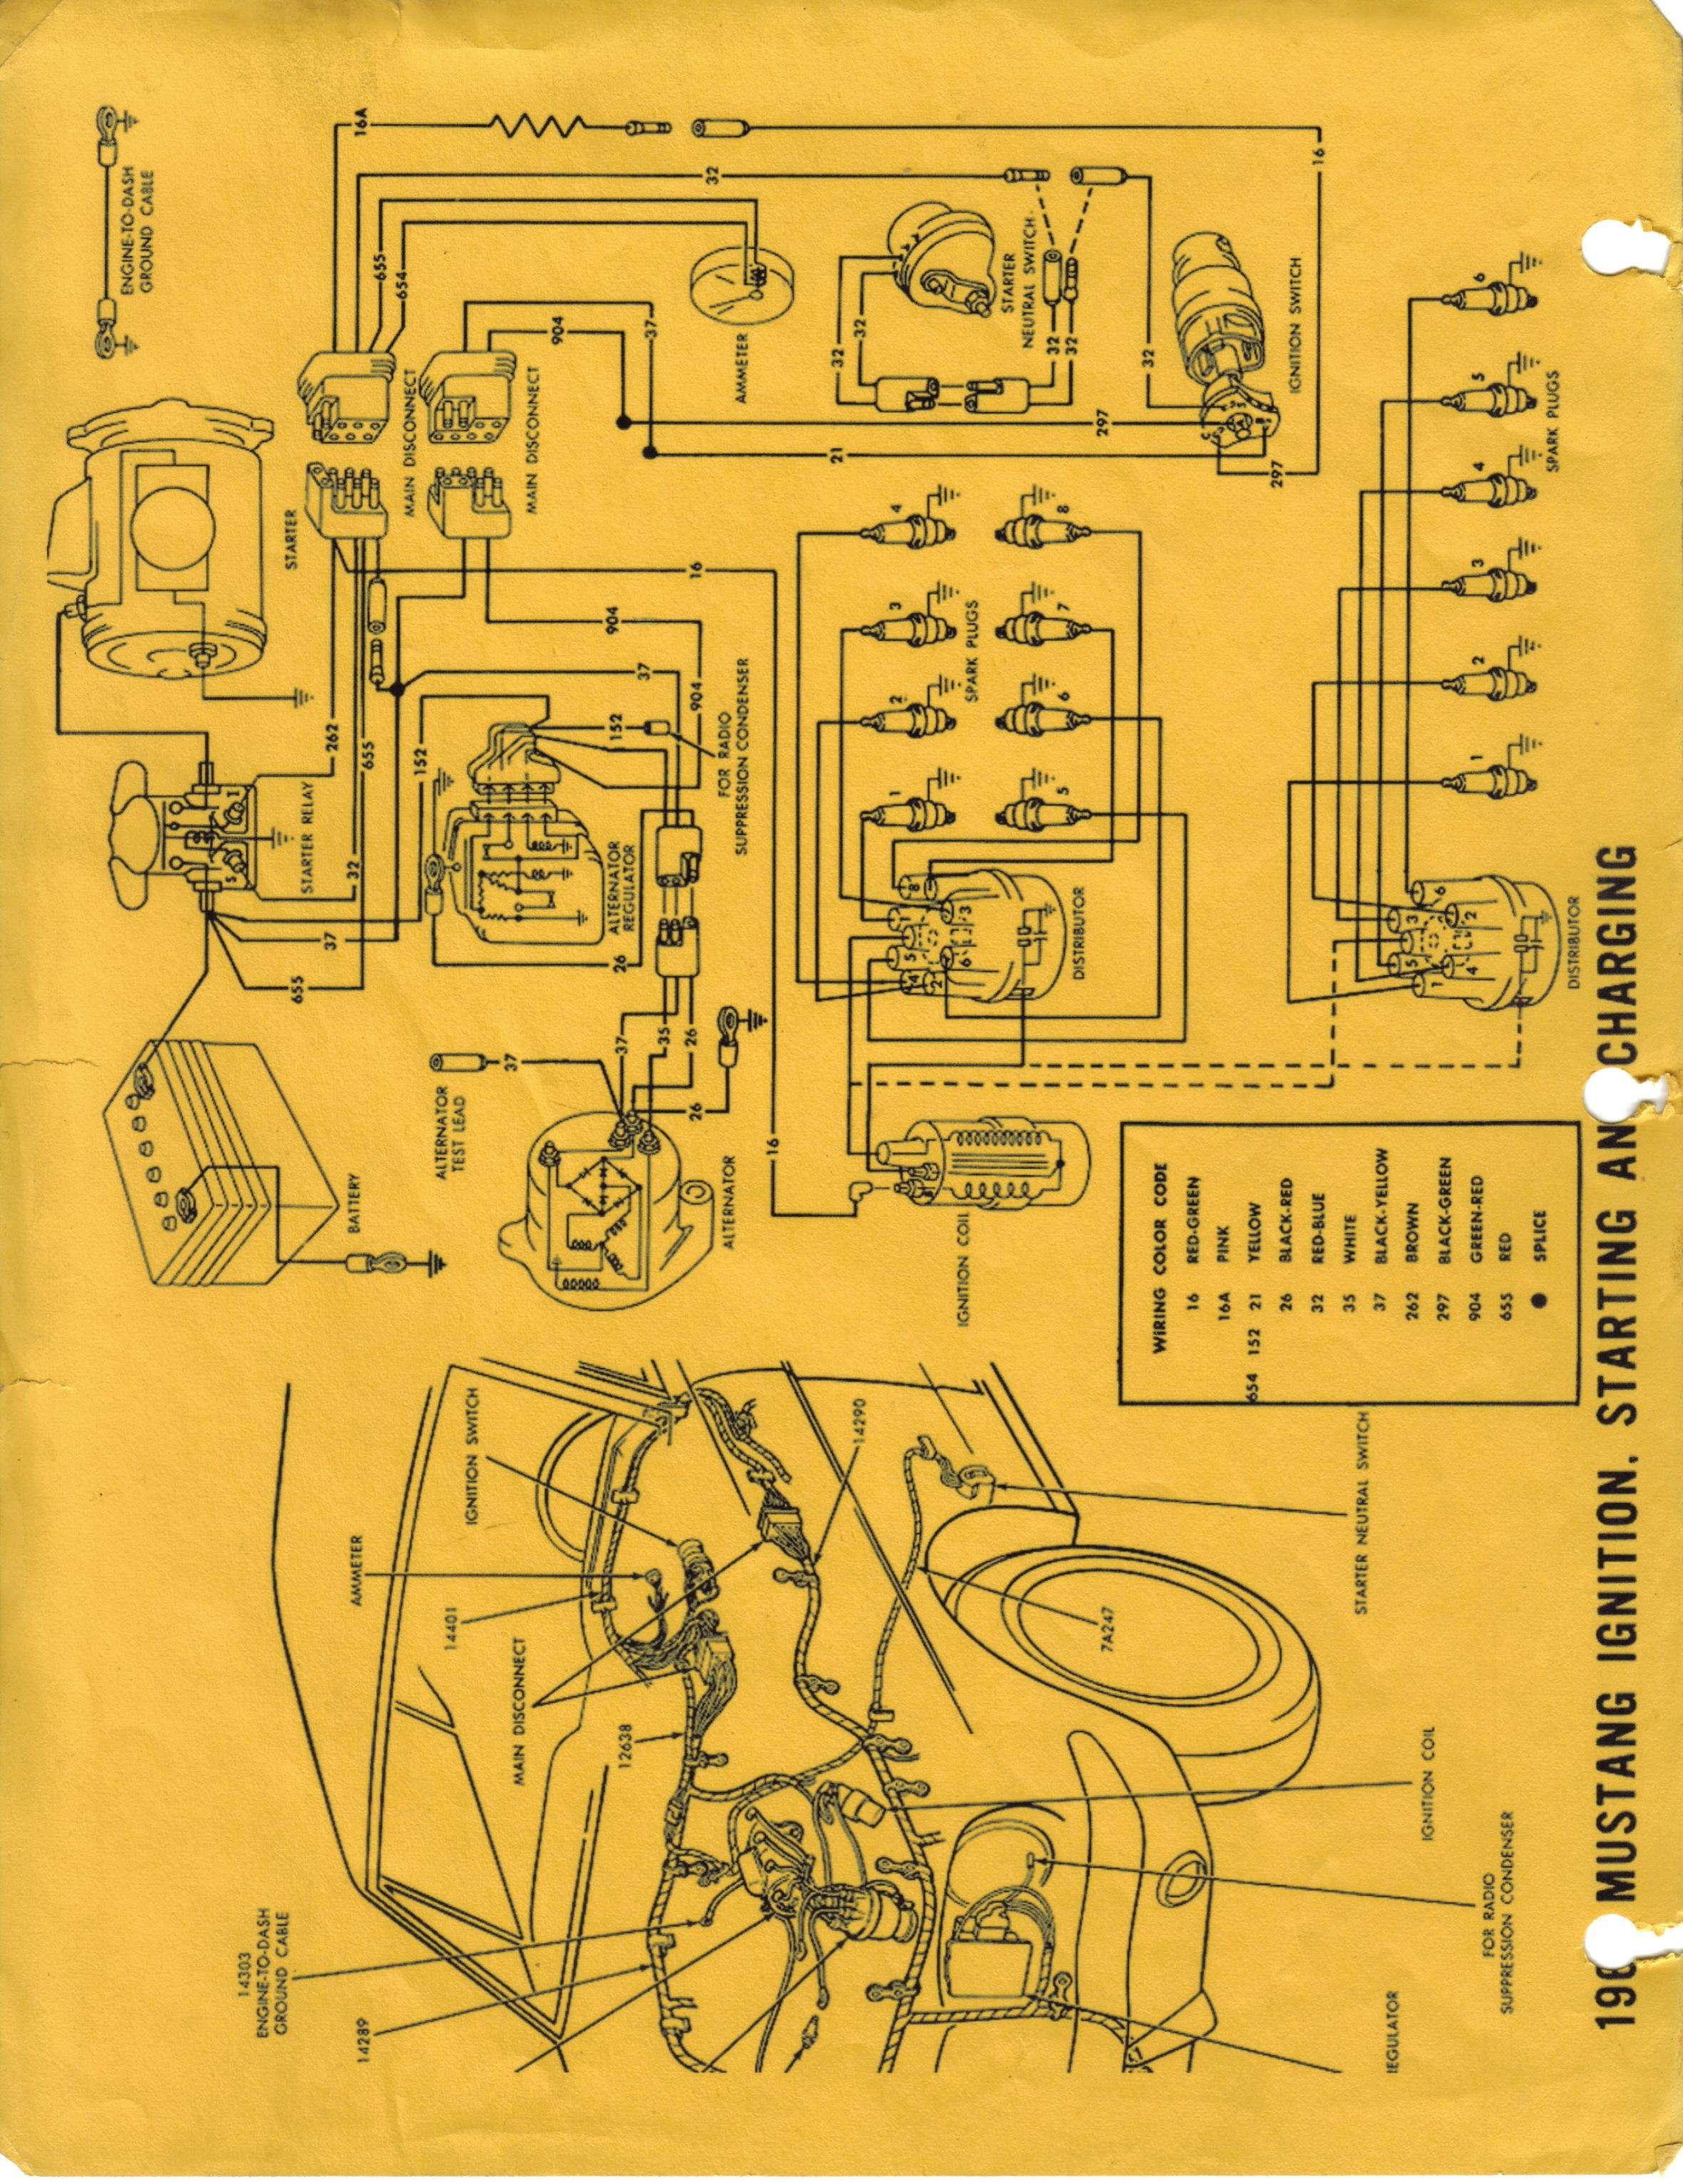 19641965 Wiring Diagram Manual Ford Mustang Forum